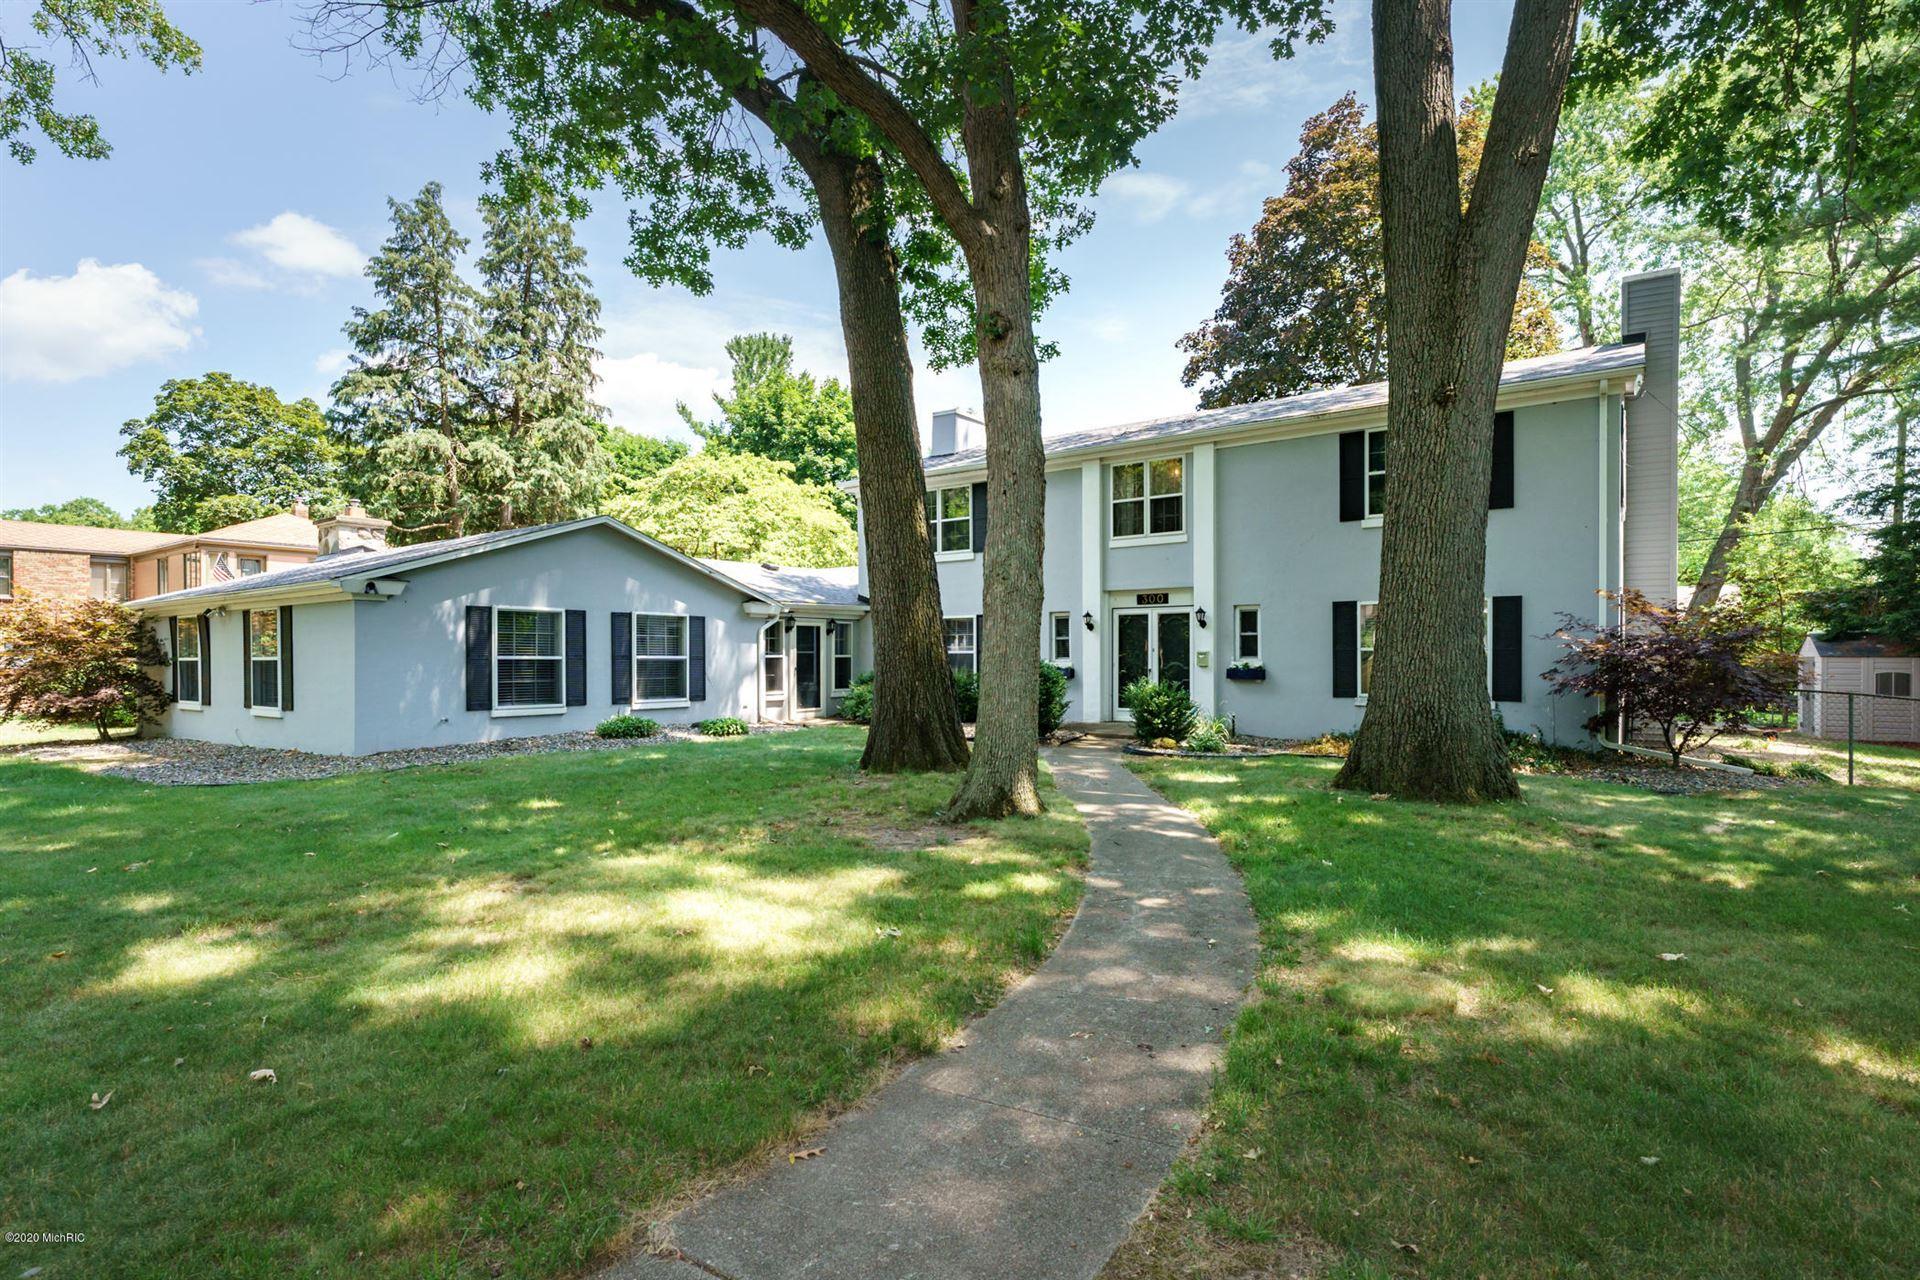 300 Orchard Avenue, Battle Creek, MI 49017 - MLS#: 20026494